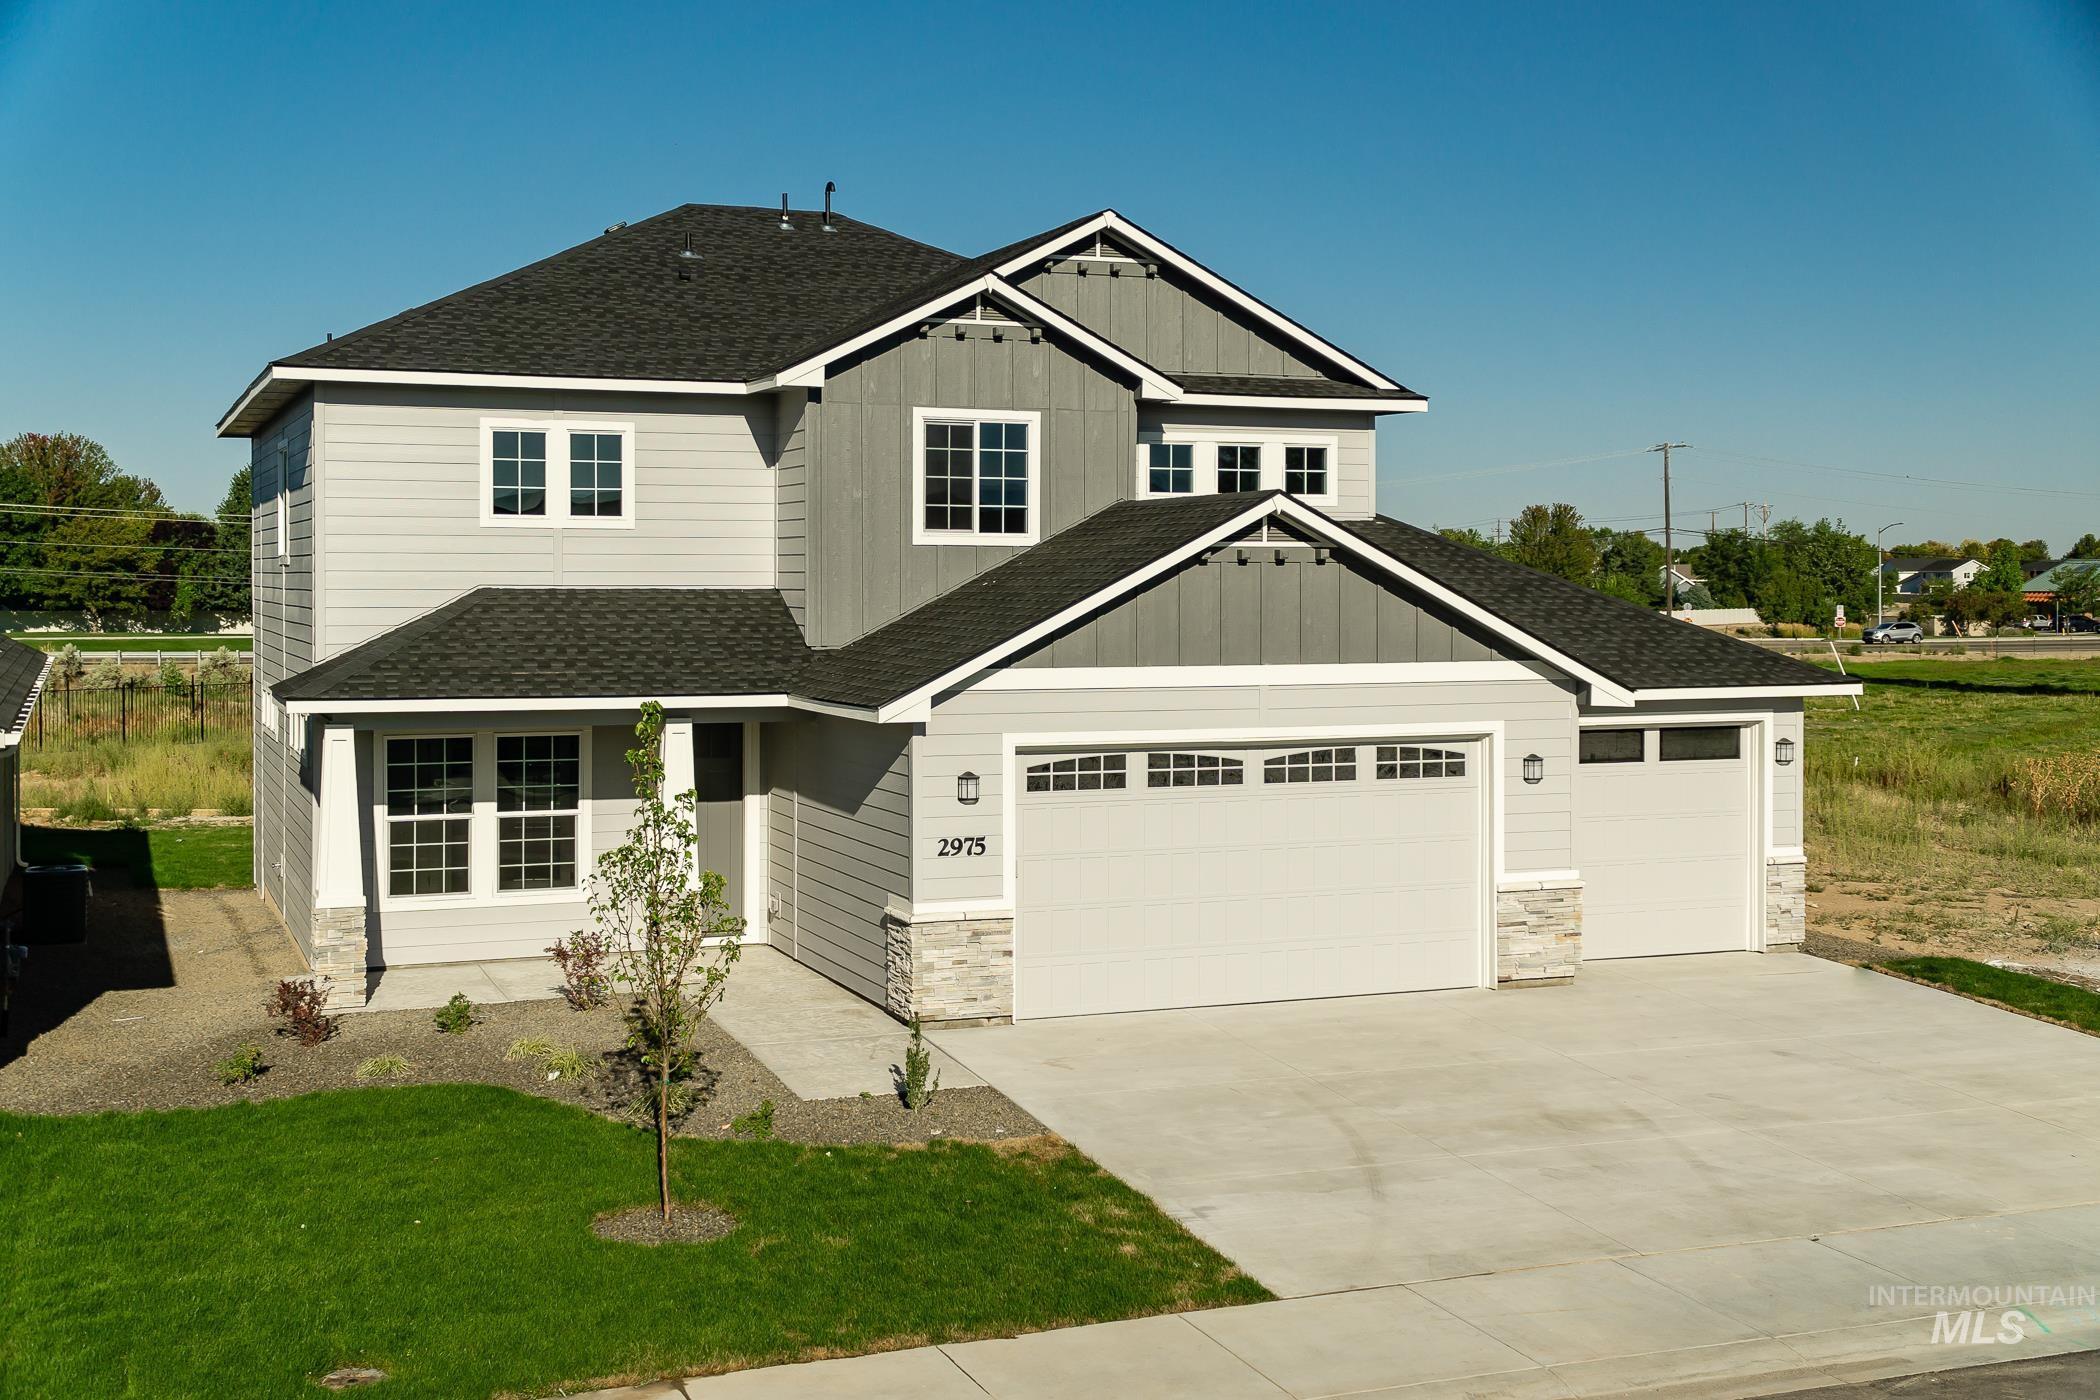 2975 N Zion Park Ave Property Photo 1